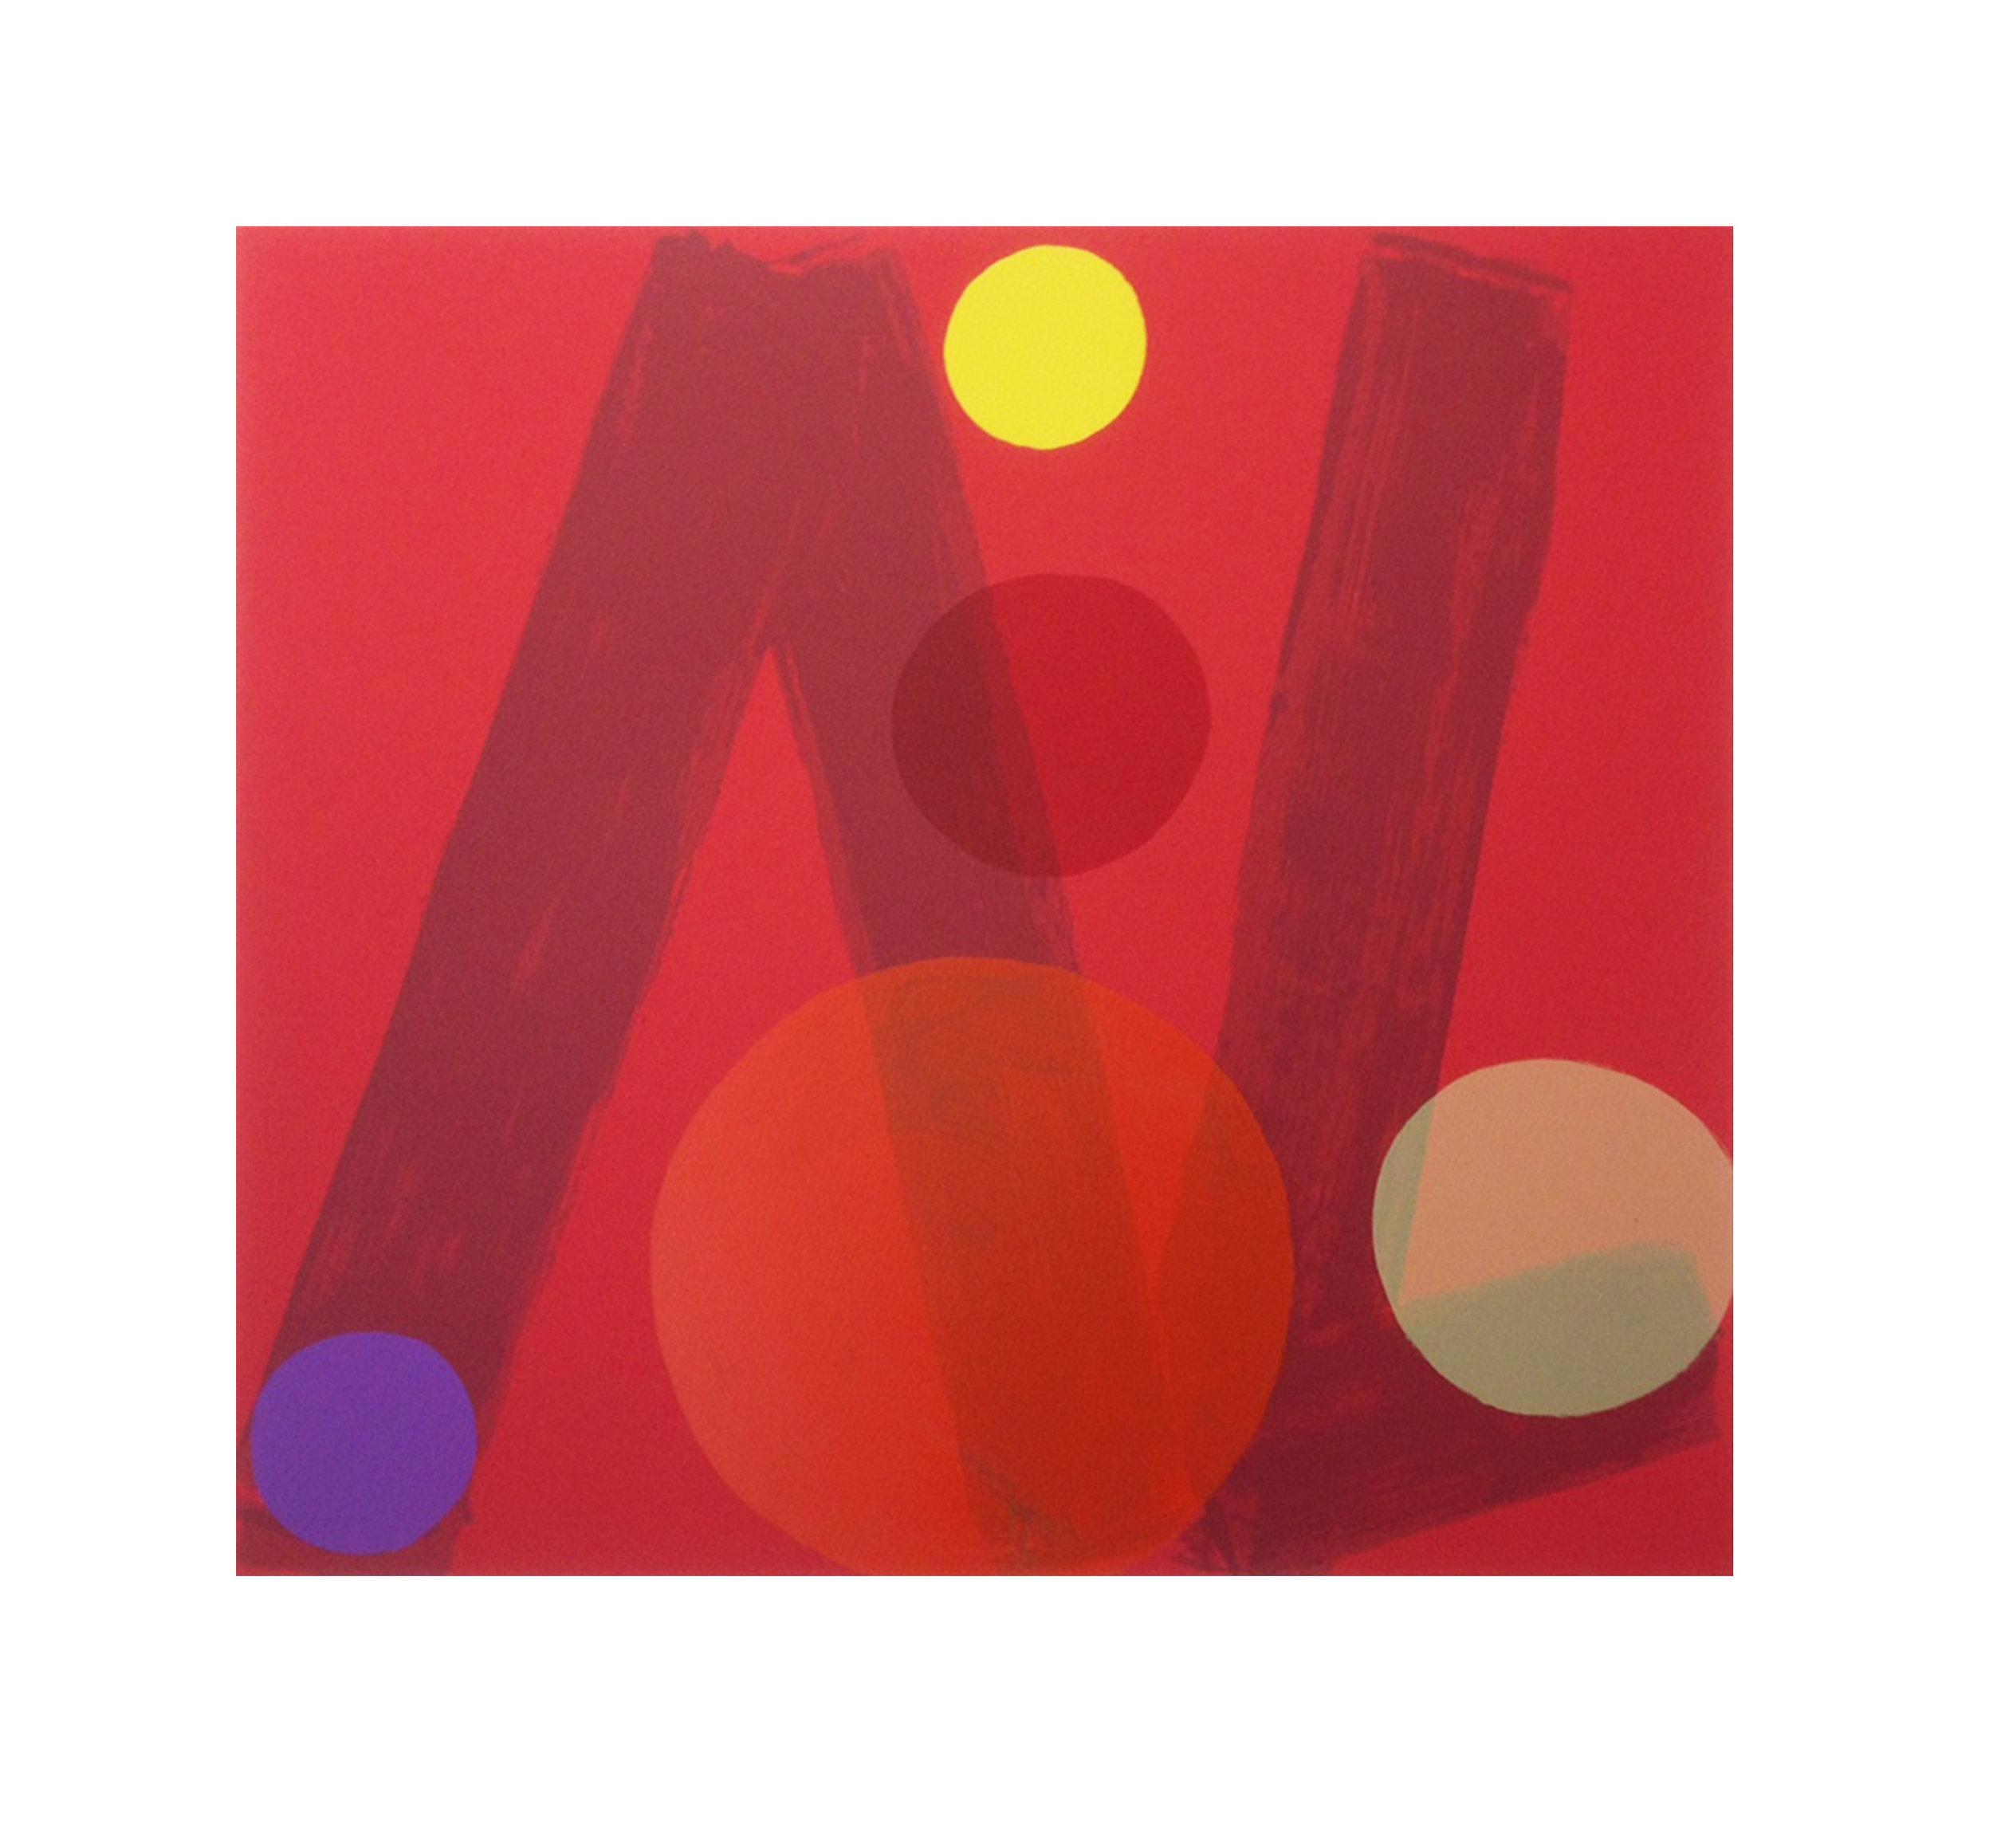 Mali Morris   RA, Rivoli Reds    Date:  2017   Size (cm - unframed):  71 x 75  Technique:  Screenprint   Materials:  Somerset Velvet 300gsm   Edition size:  30   Publisher:  The Print Studio   Copyright:  The Artist    P.O.A.